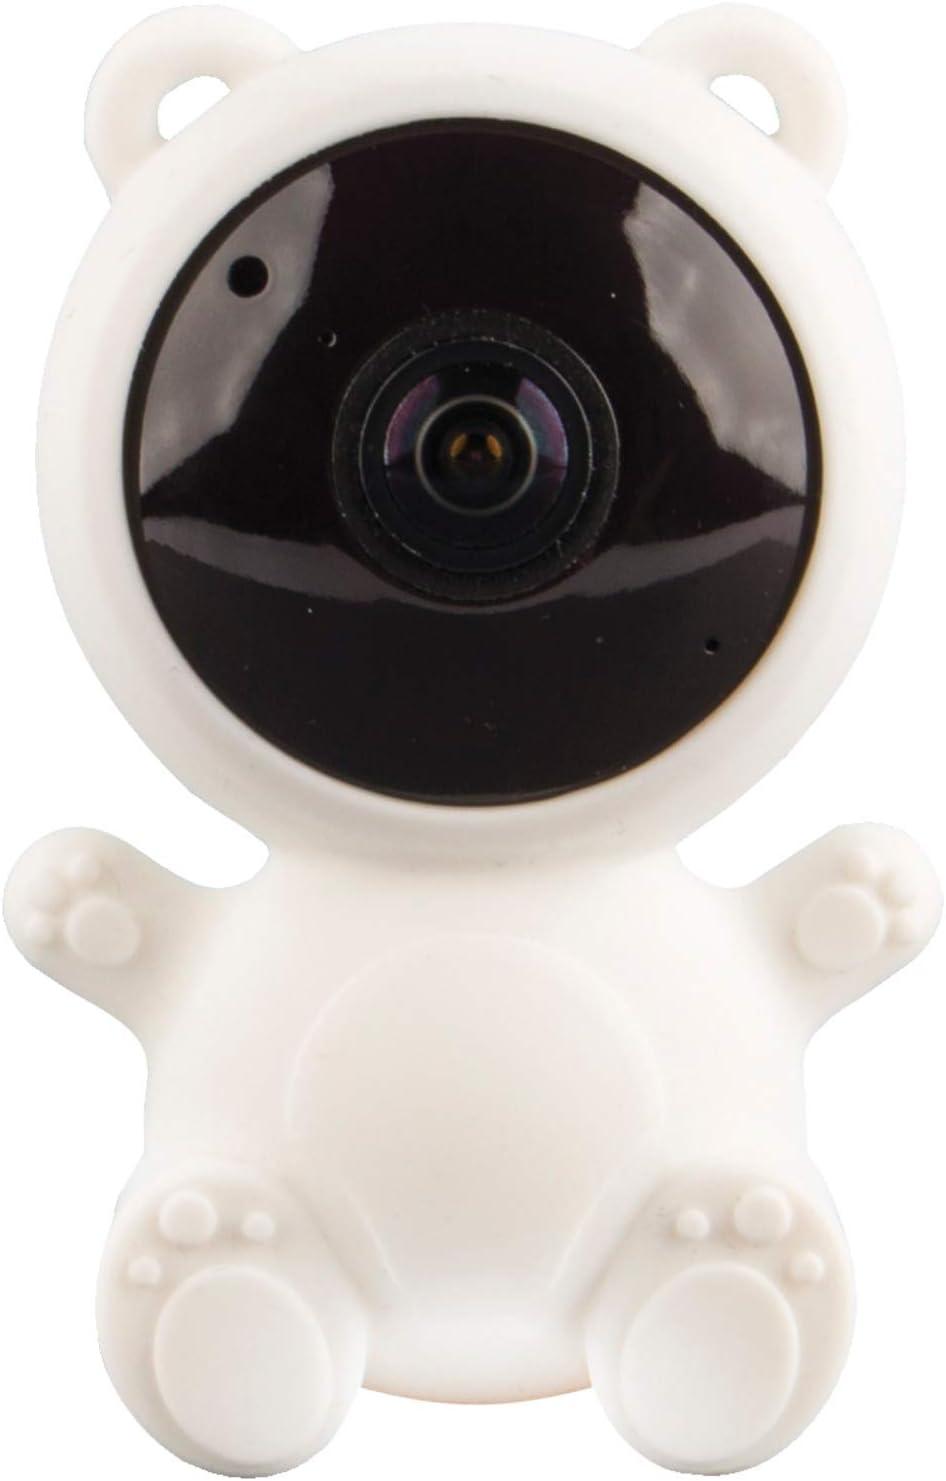 Vivitar Baby Monitor with Camera and Audio and Phone App, Vivitar IPC-120-WHT IP Baby Video Monitor Wifi